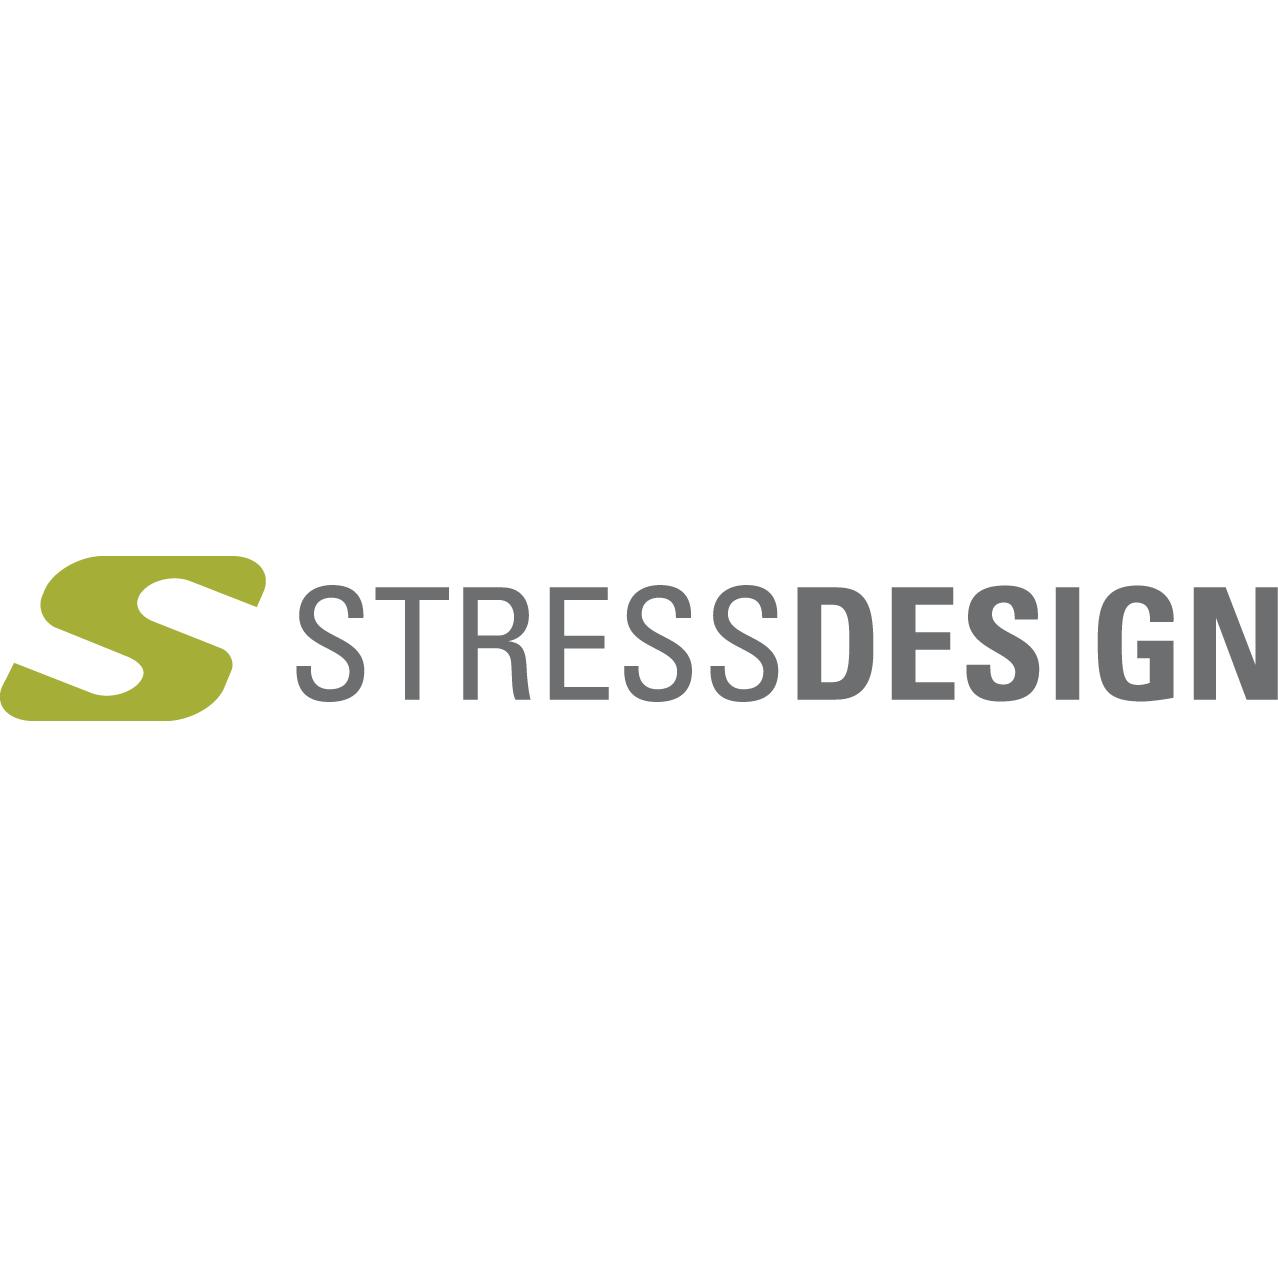 Stressdesign